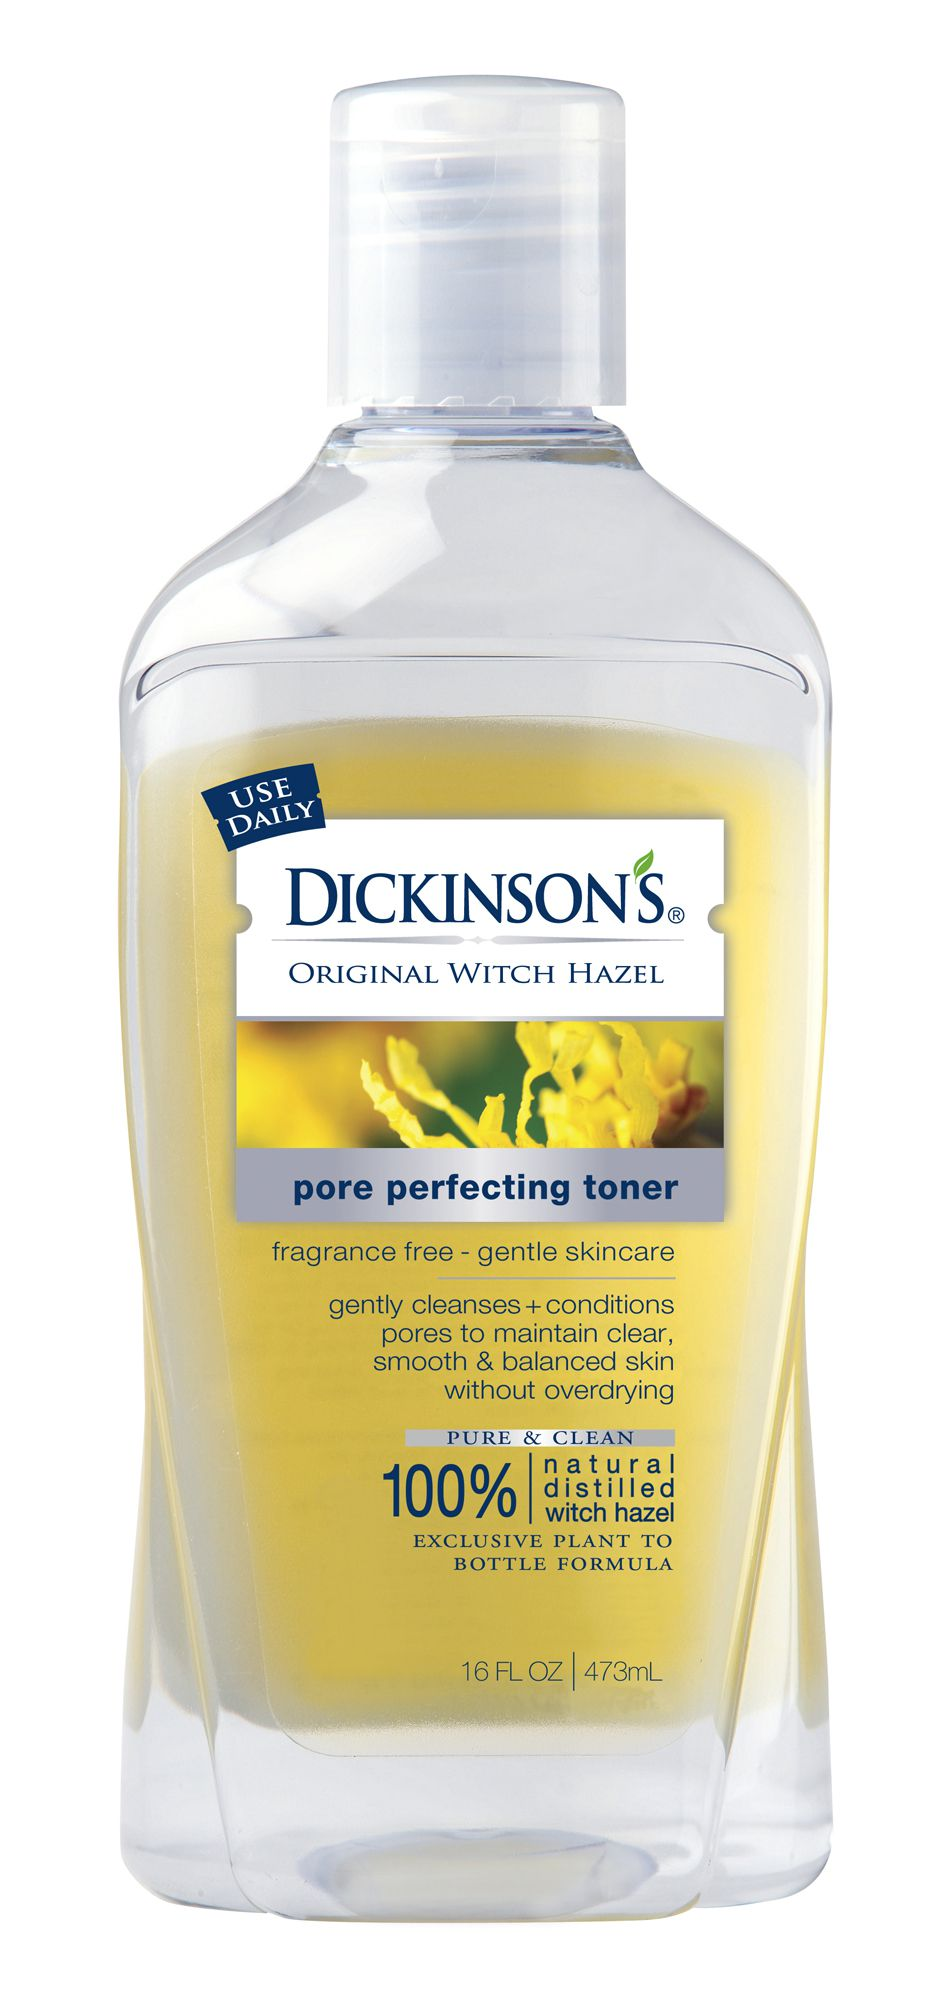 dickinsons pore perfecting toner